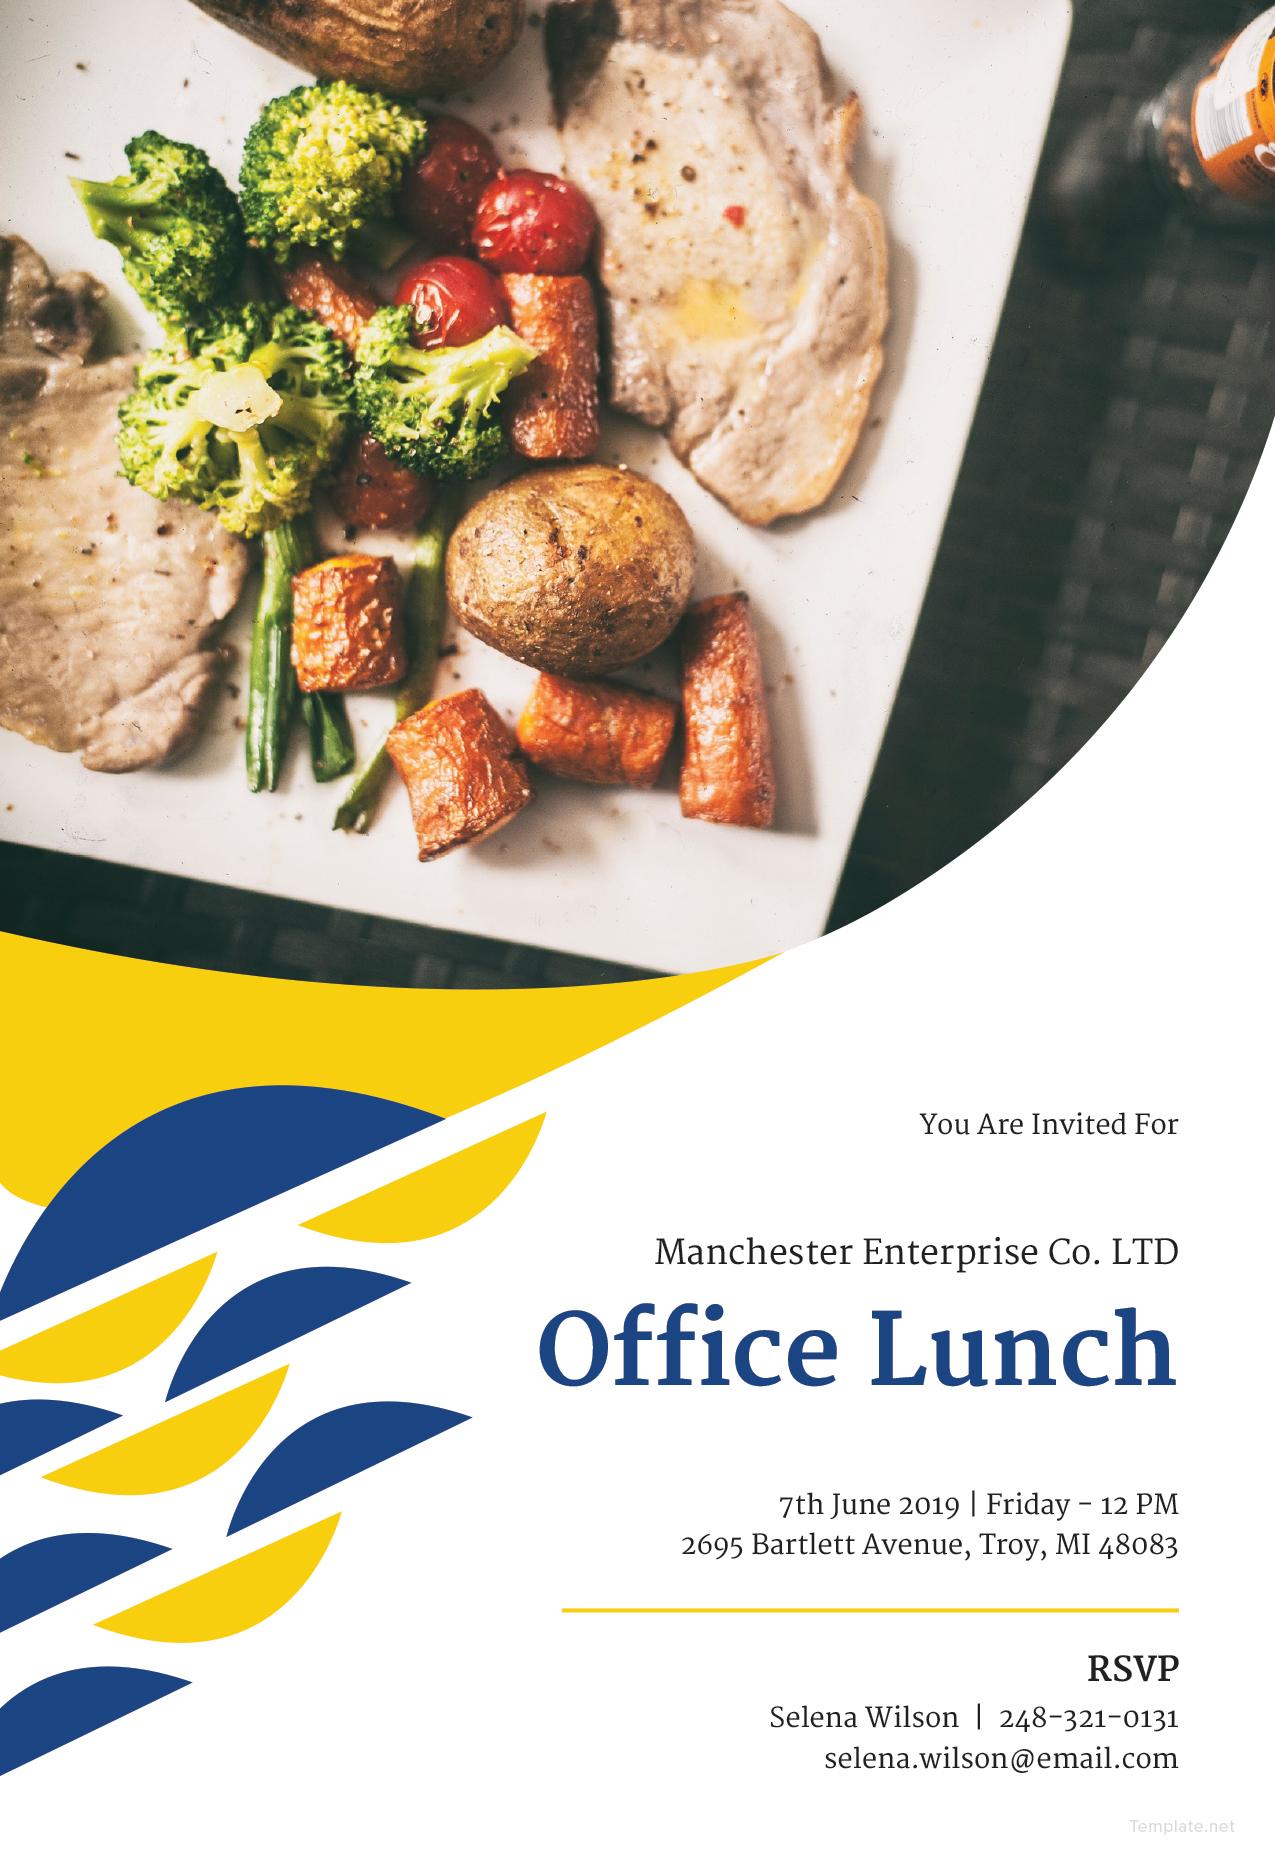 Free Office Lunch Invitation Template In Microsoft Word Microsoft Publisher Adobe Illustrator